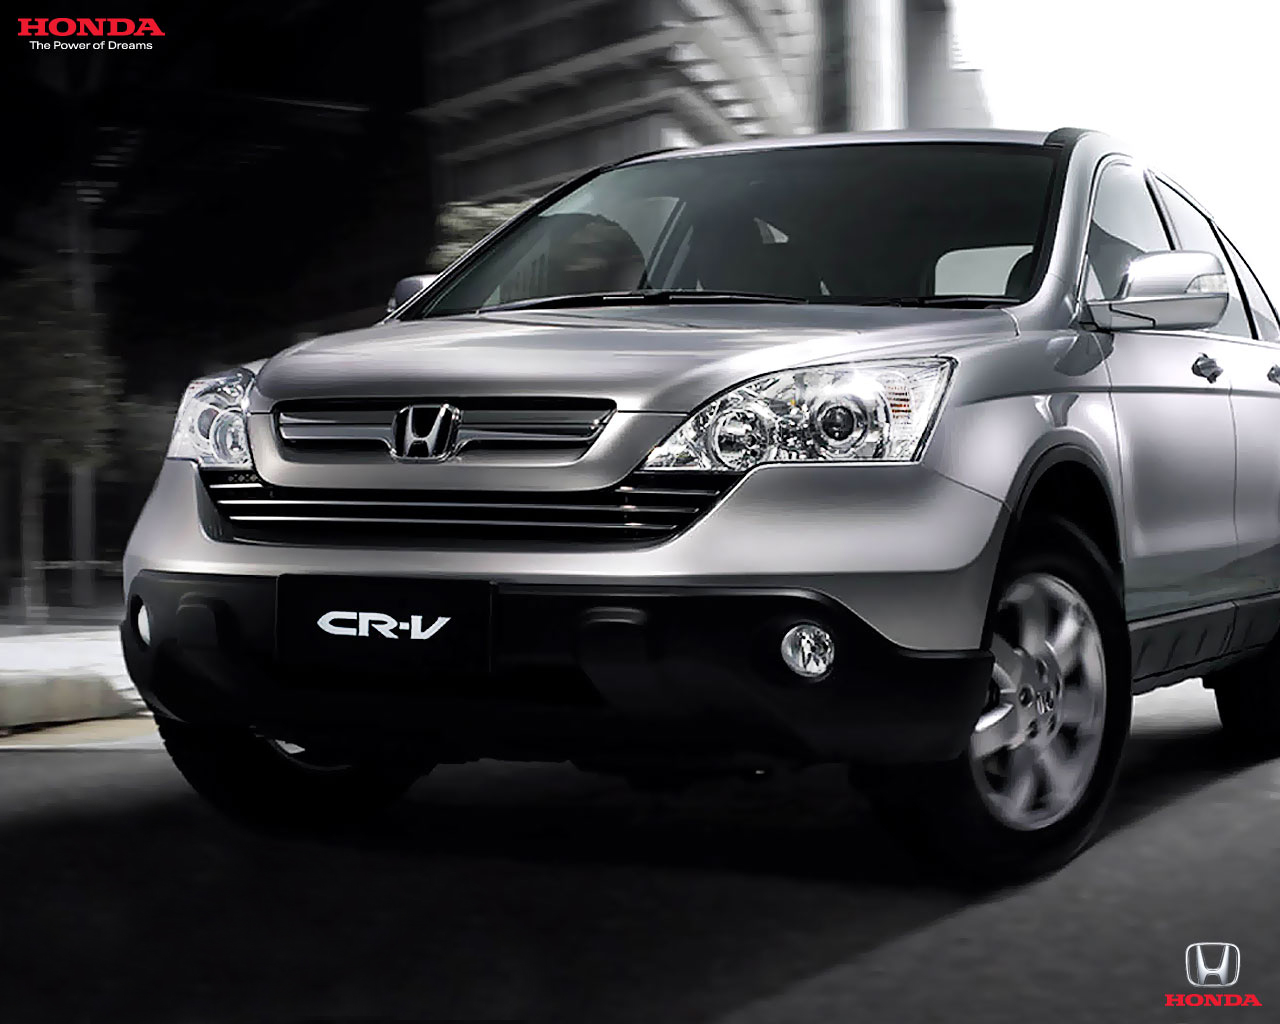 Honda CR V Wallpapers  HD Wallpapers Pulse